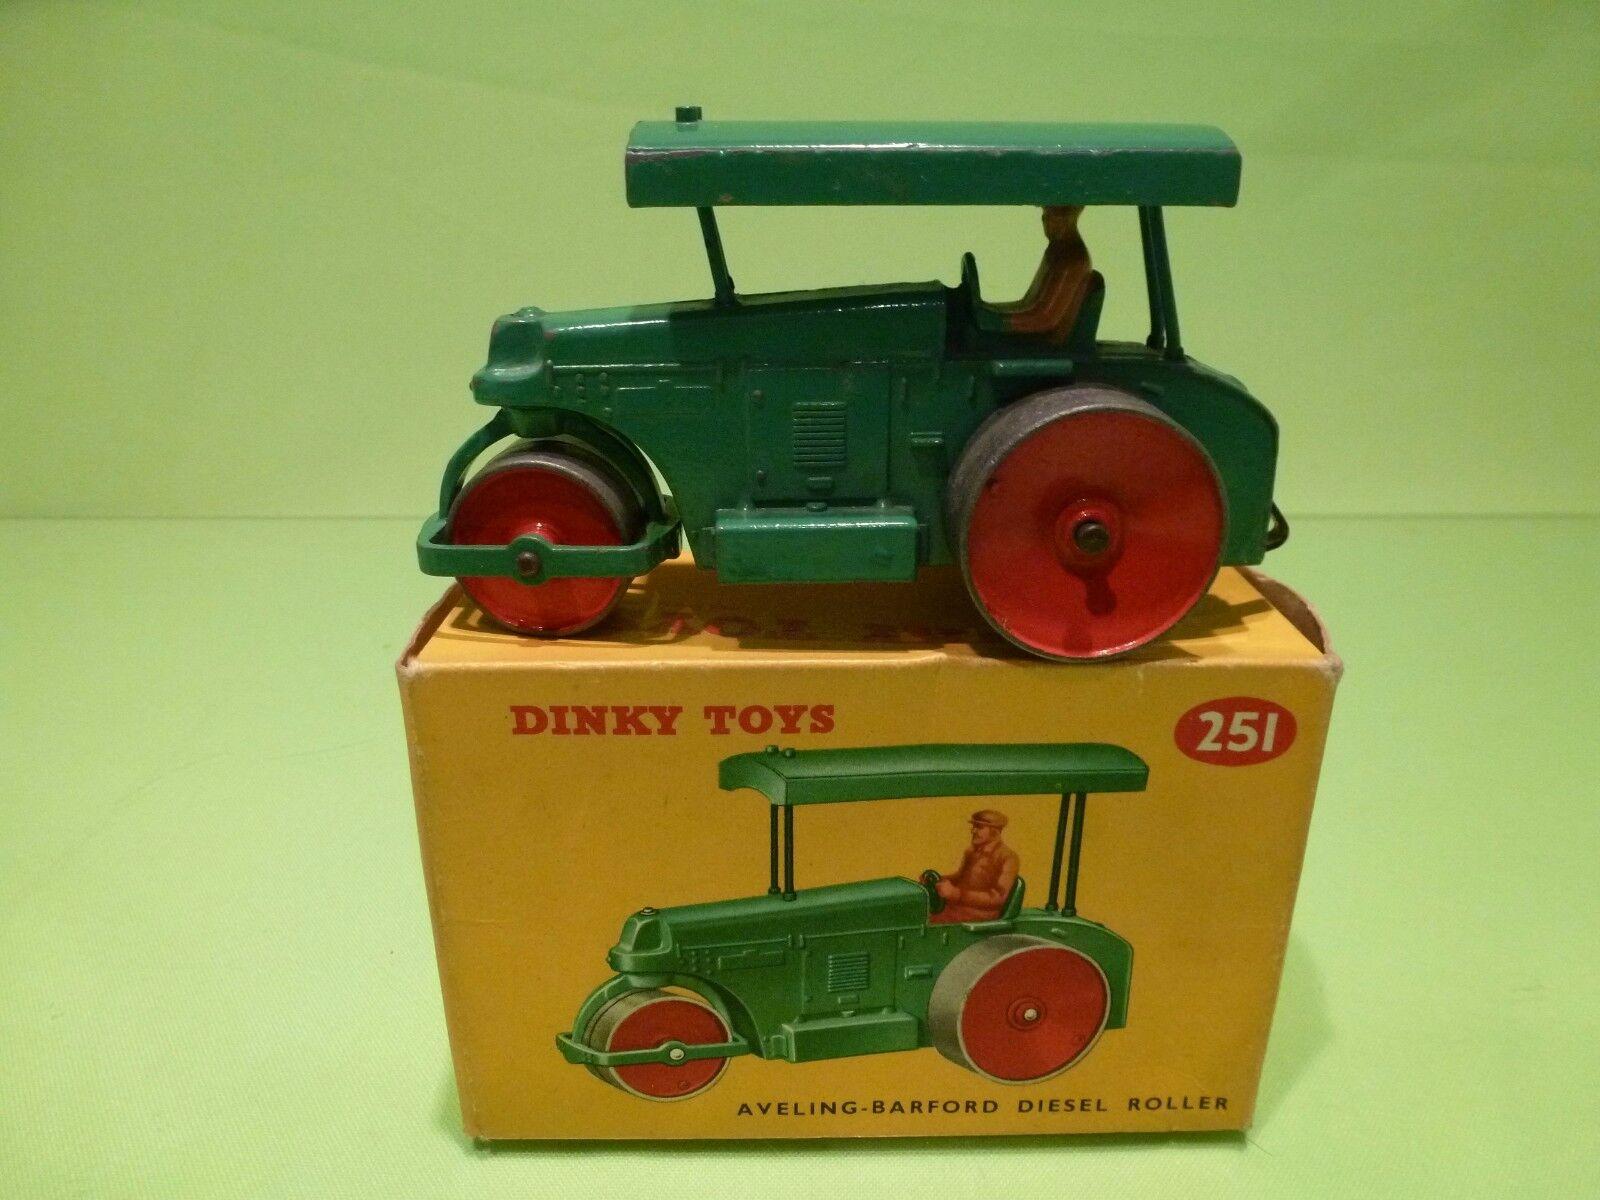 DINKY TOYS 251 AVELING BARFORD DIESEL ROLLER - verde - EXCELLENT IN BOX